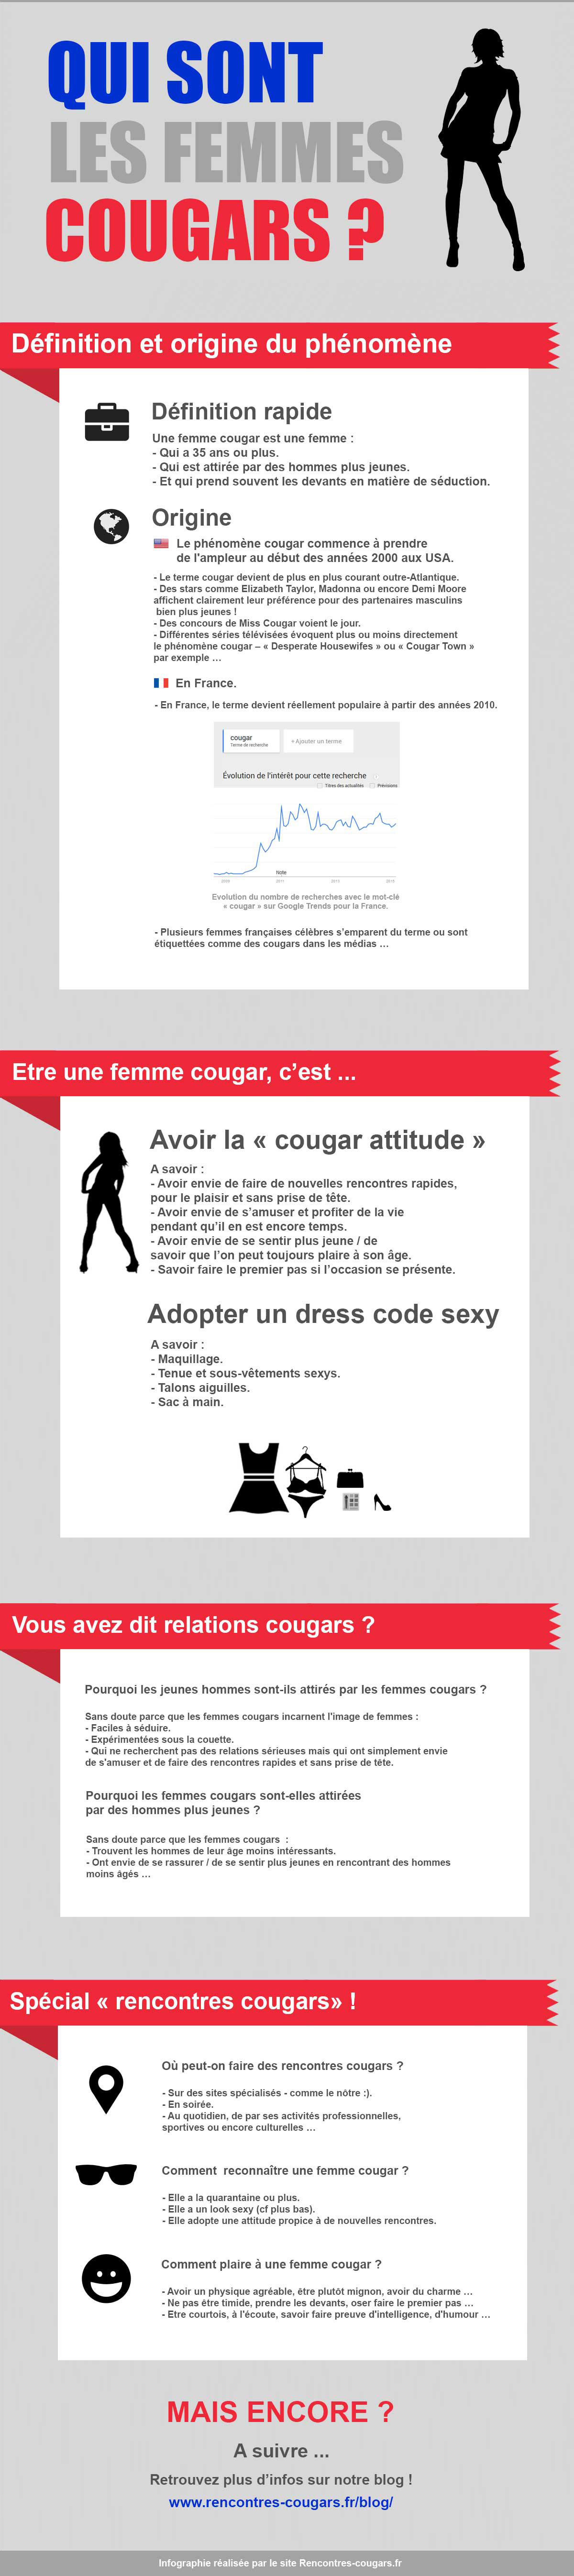 infogroaphie-cougar